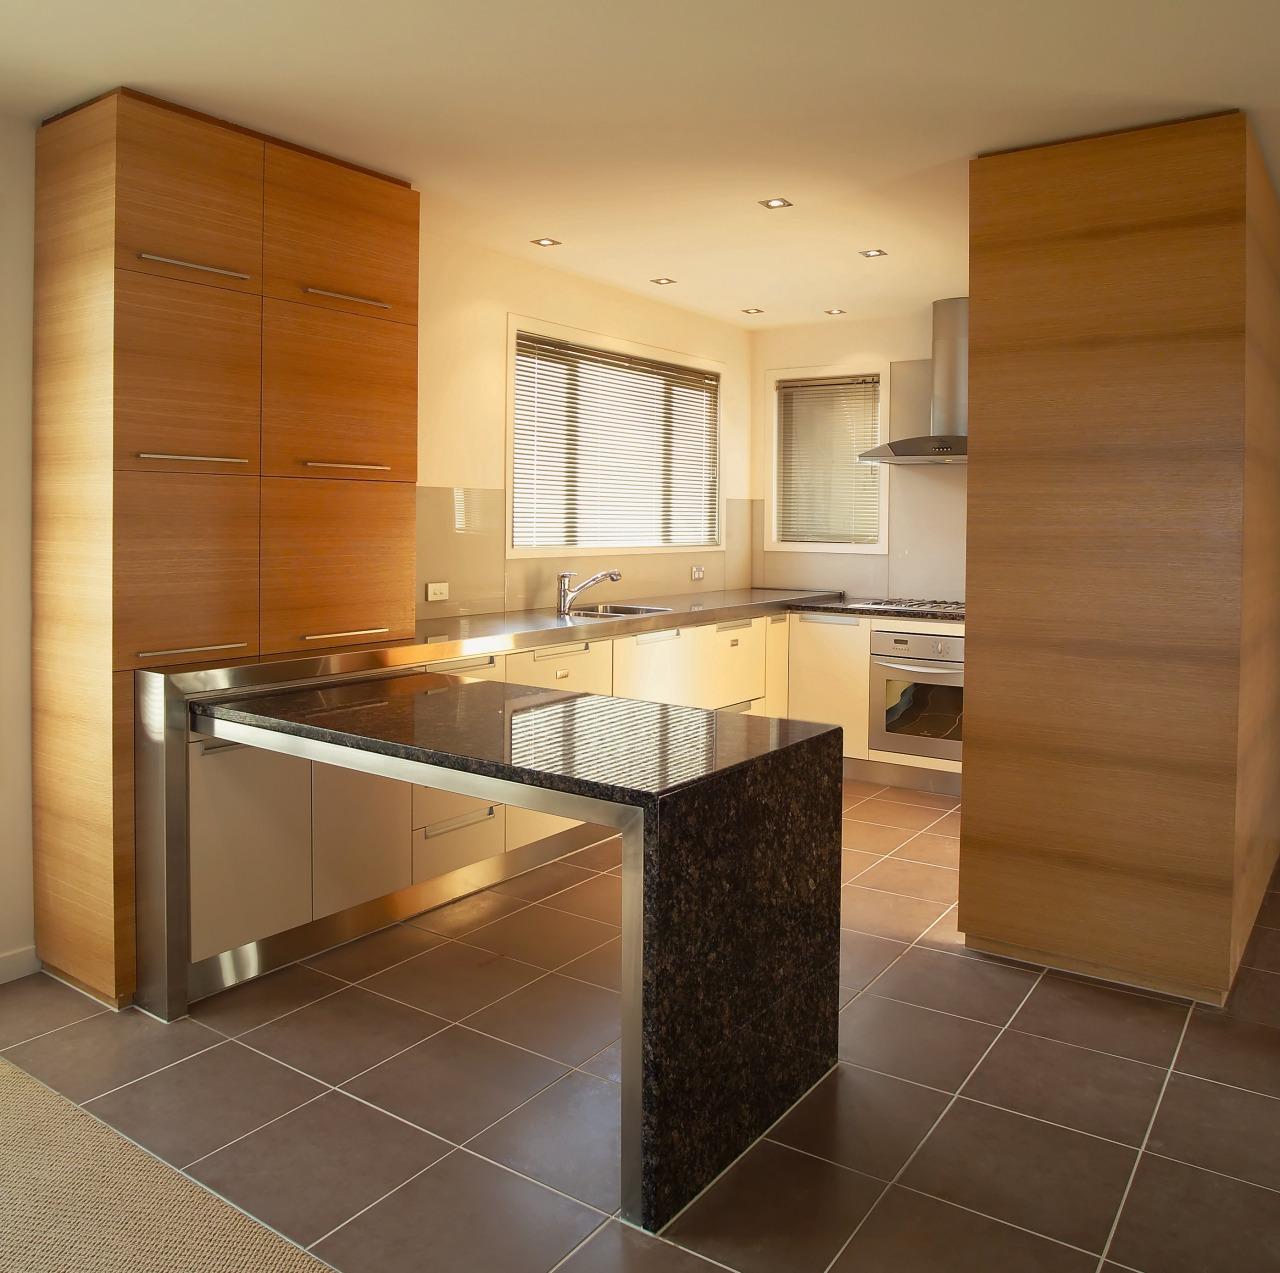 A view of a kitchen area, black tiled cabinetry, countertop, cuisine classique, floor, flooring, interior design, kitchen, real estate, room, brown, orange